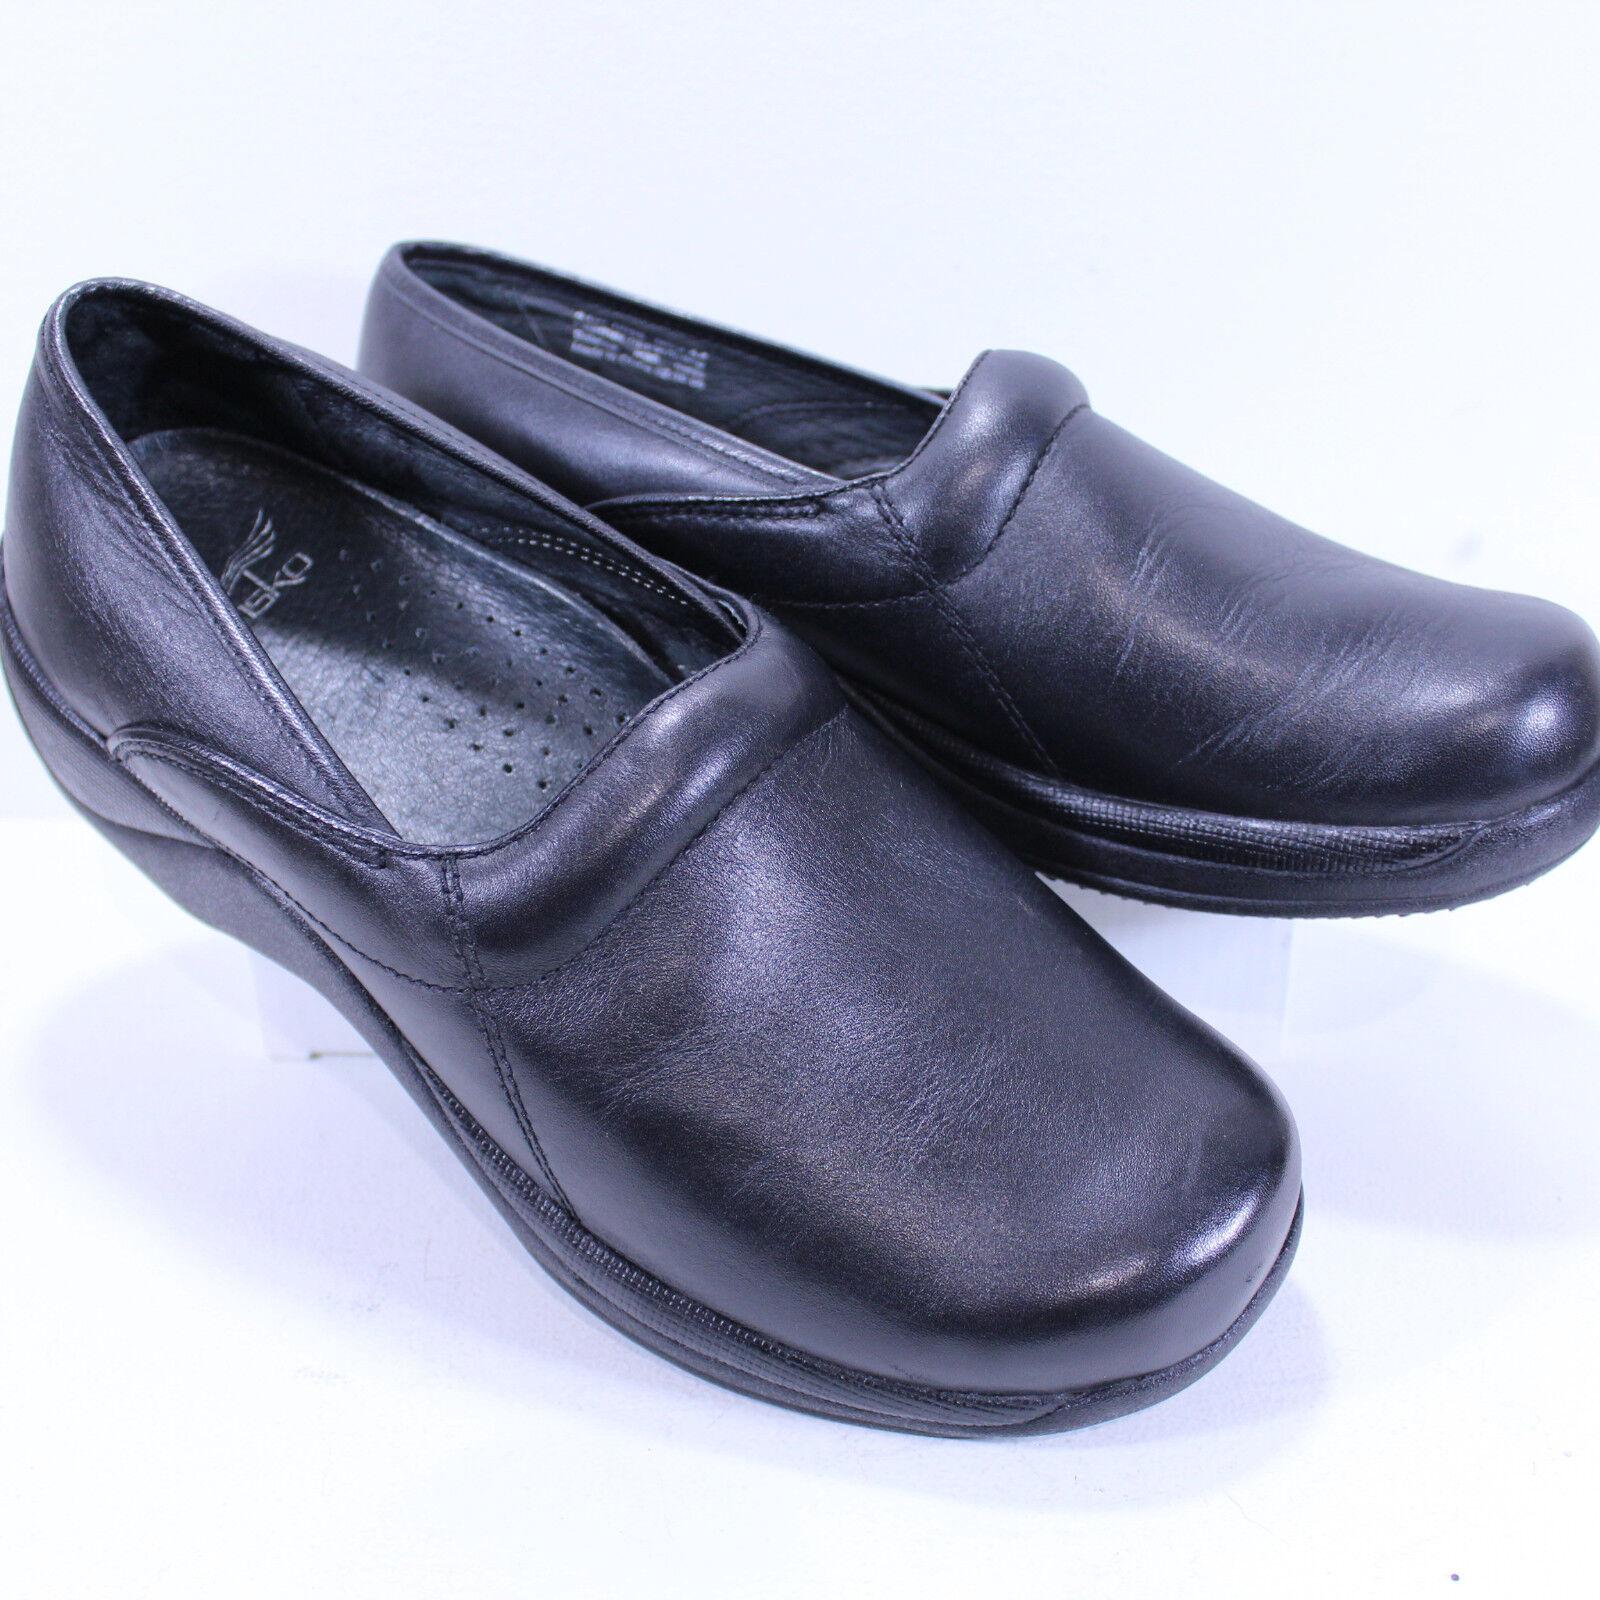 DANSKO XP Professional Clog Black Leather Slip Resistant Euro 44 10.5US